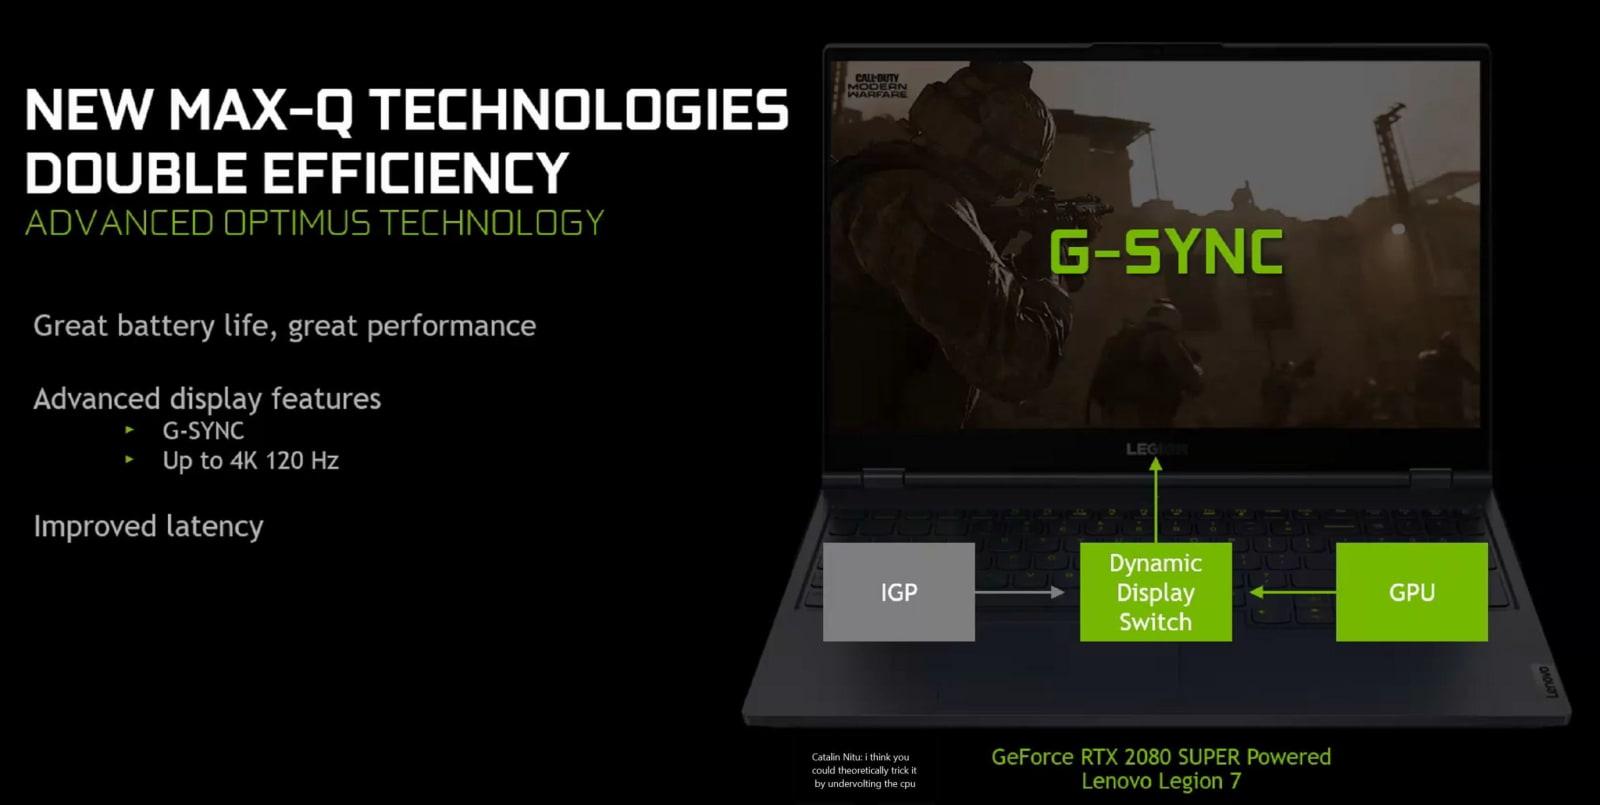 NVIDIA advanced optimus technology